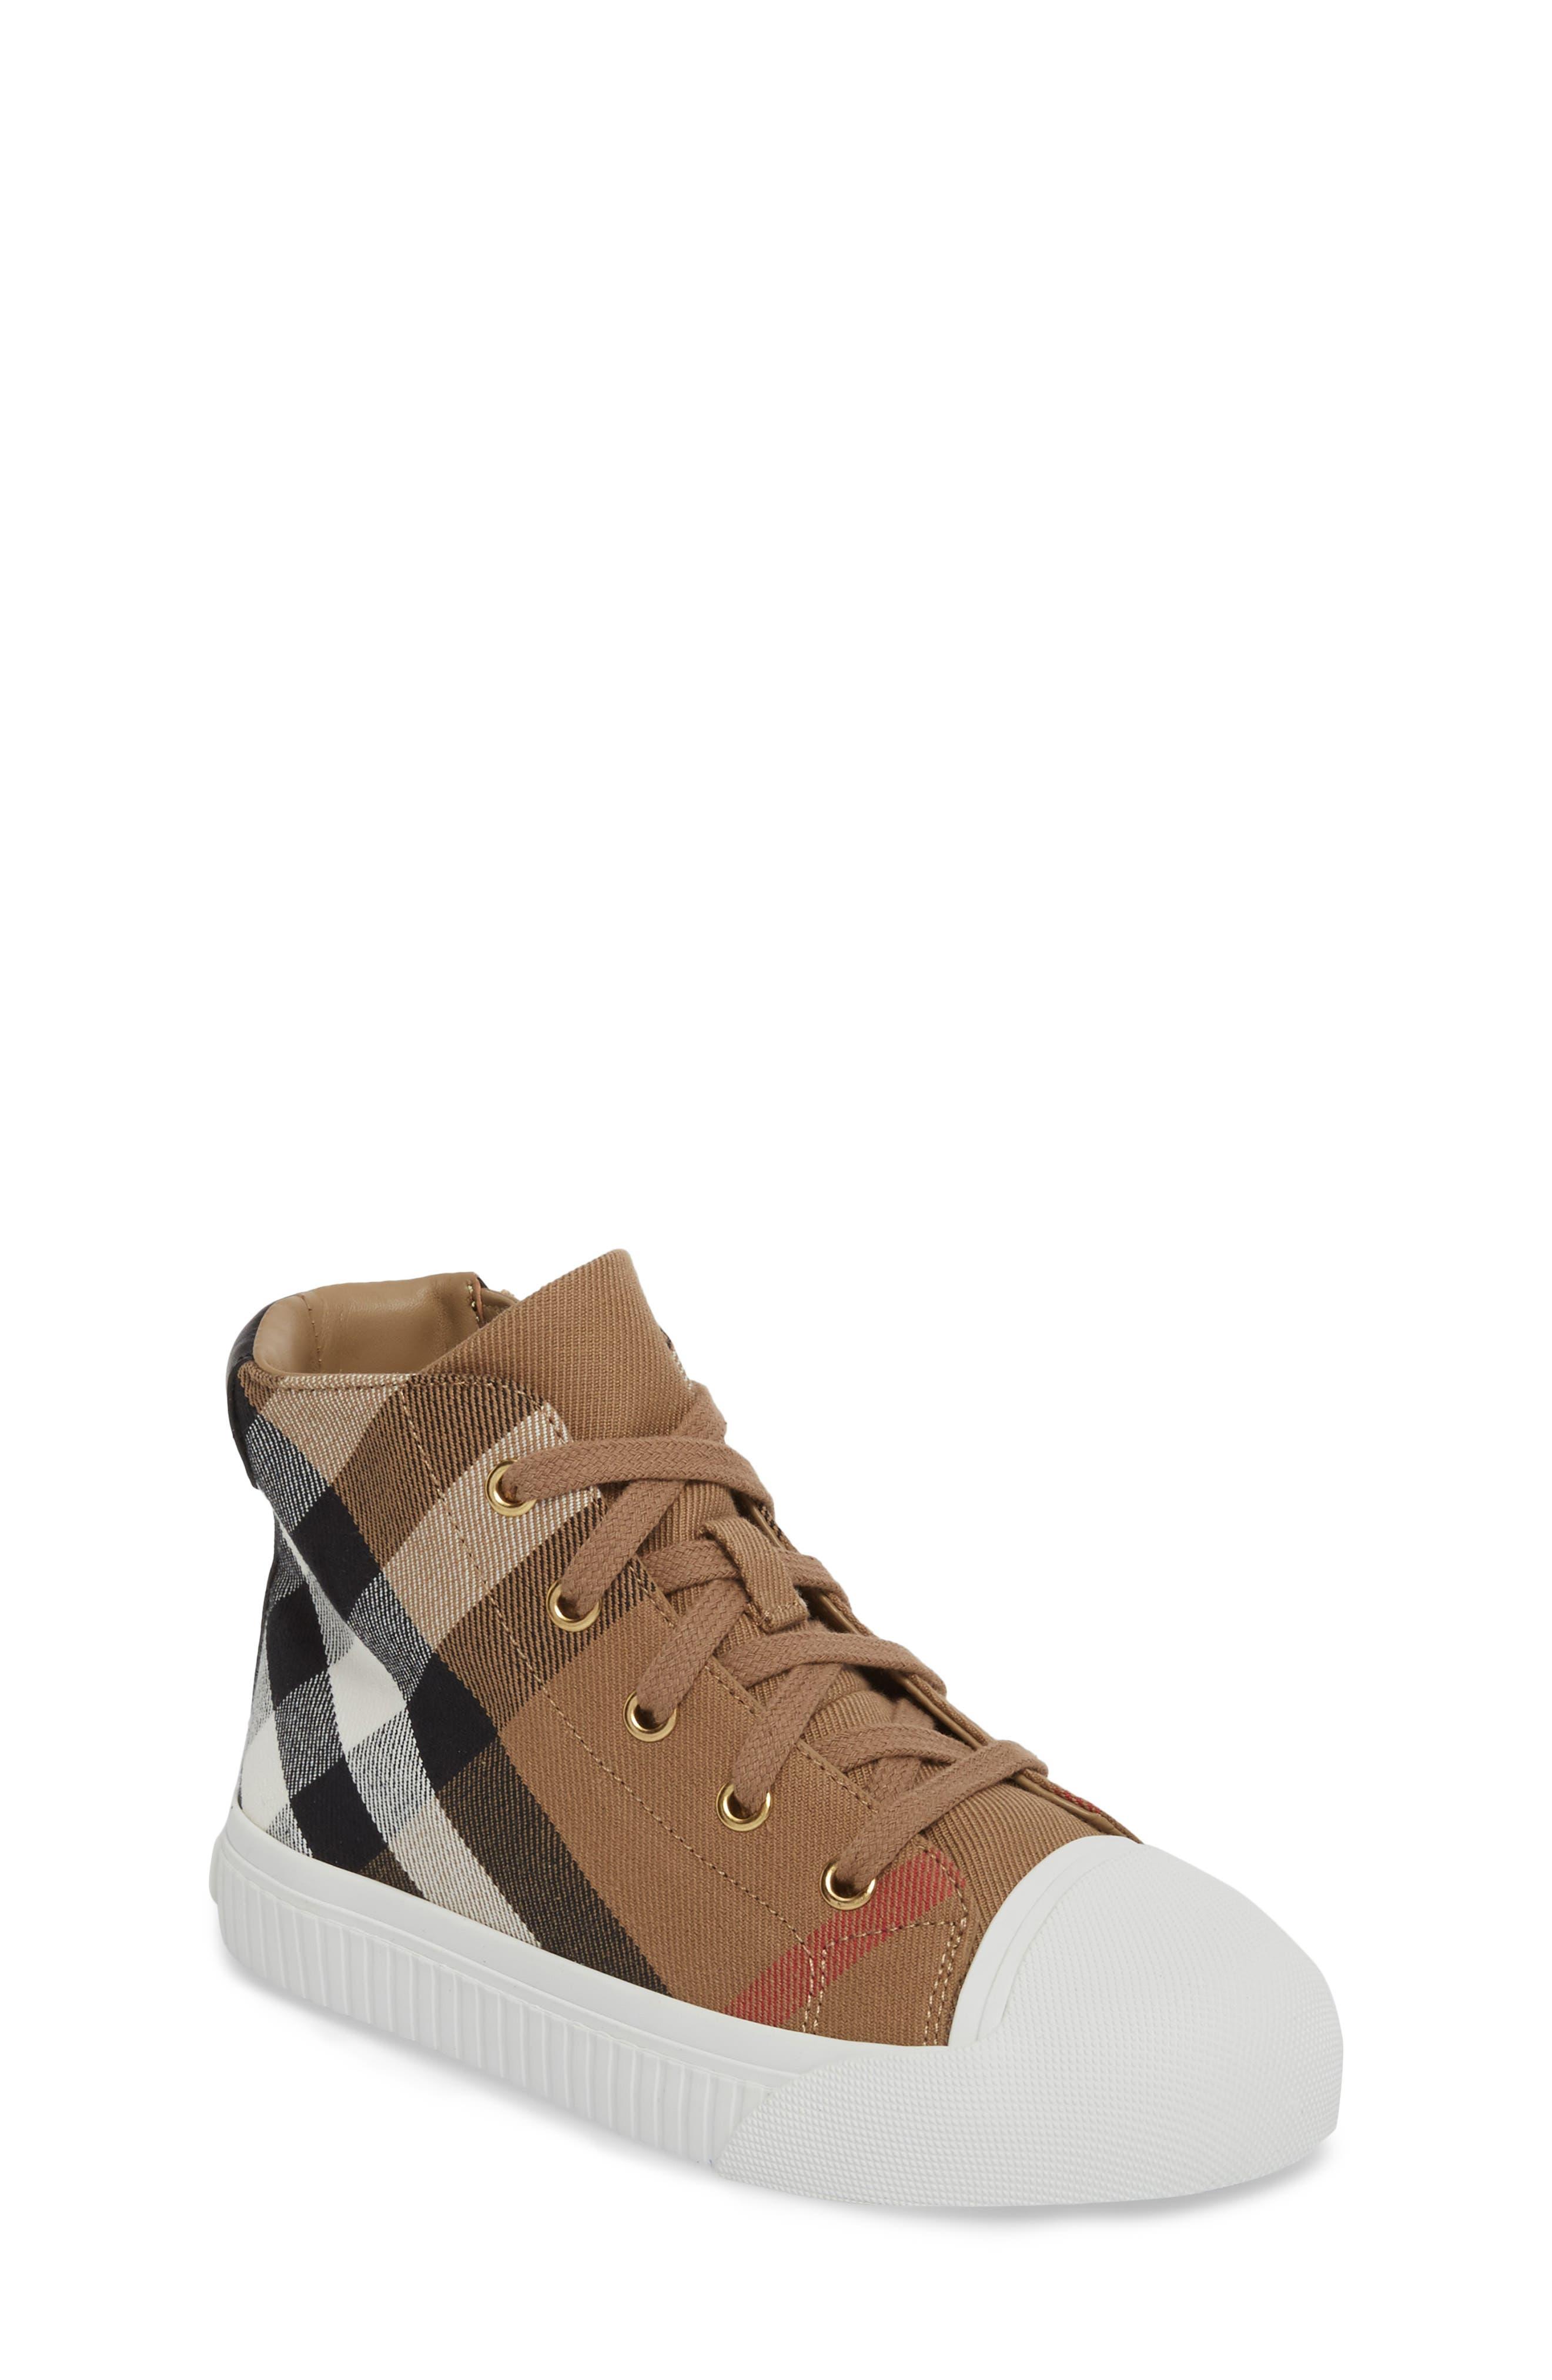 Belford High Top Sneaker,                             Main thumbnail 1, color,                             Classic/ Neon Green